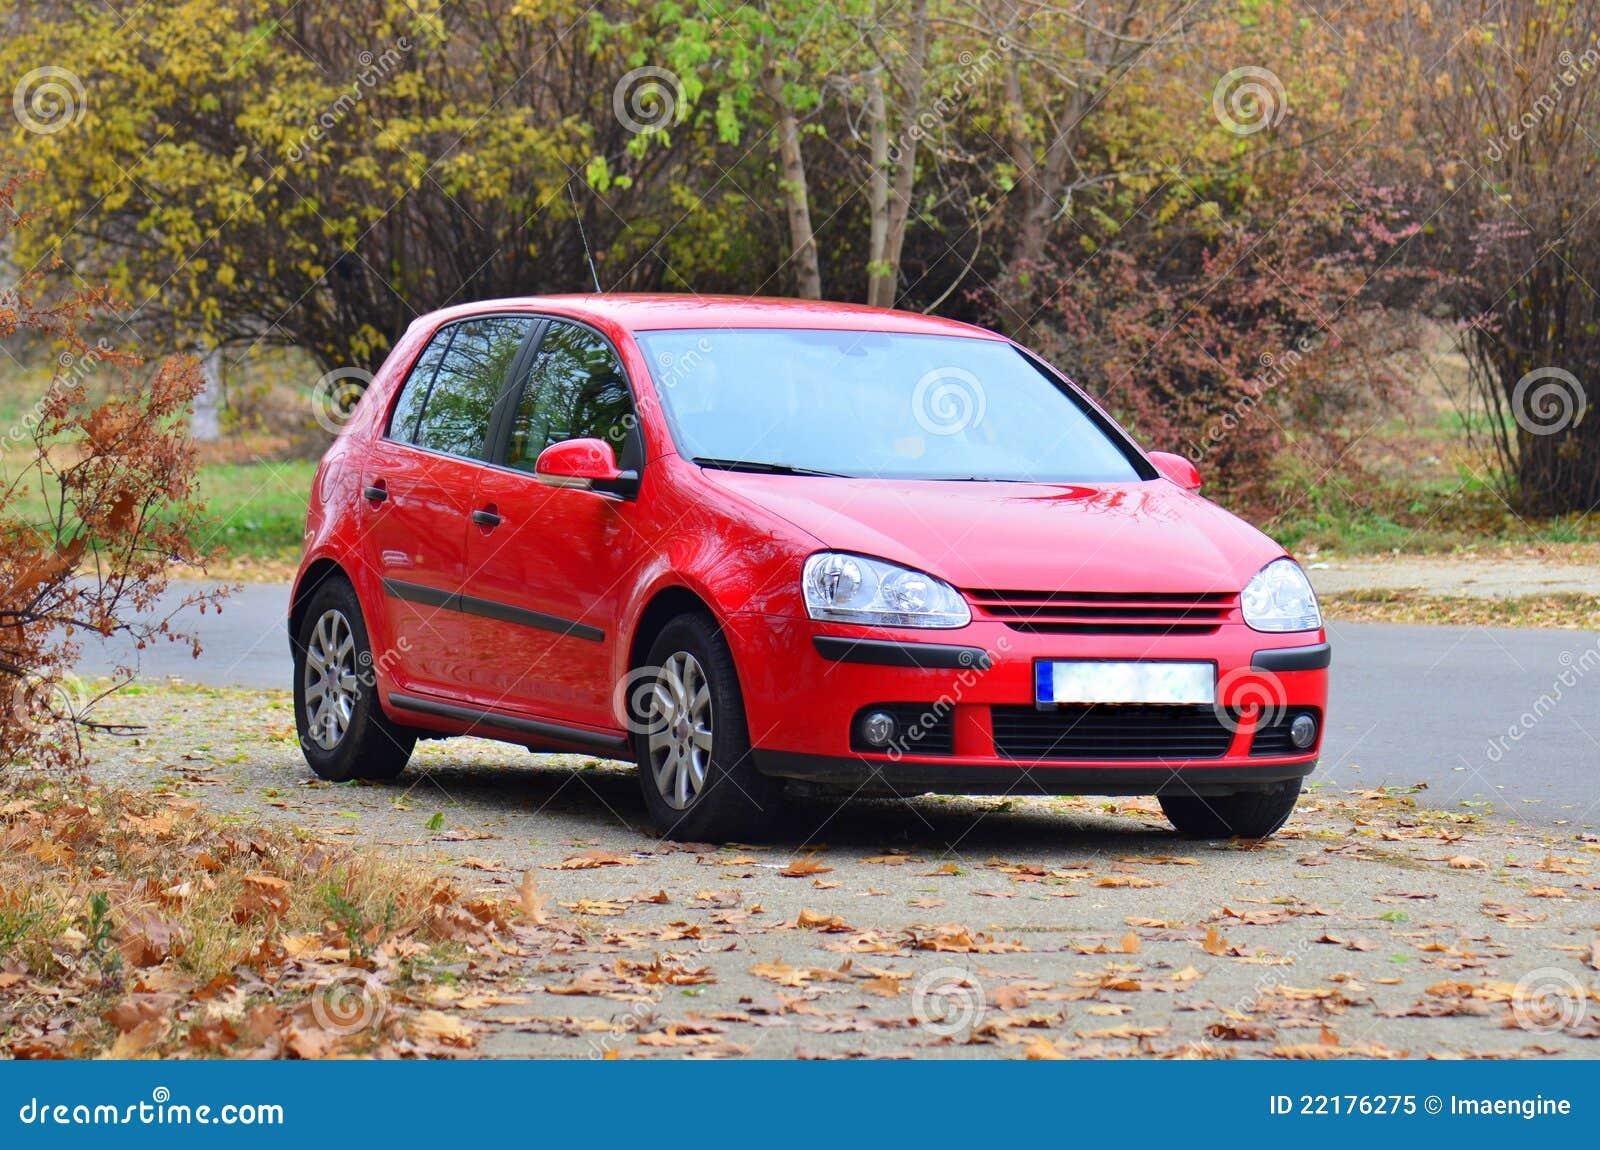 Red Volkswagen GTI Golf car